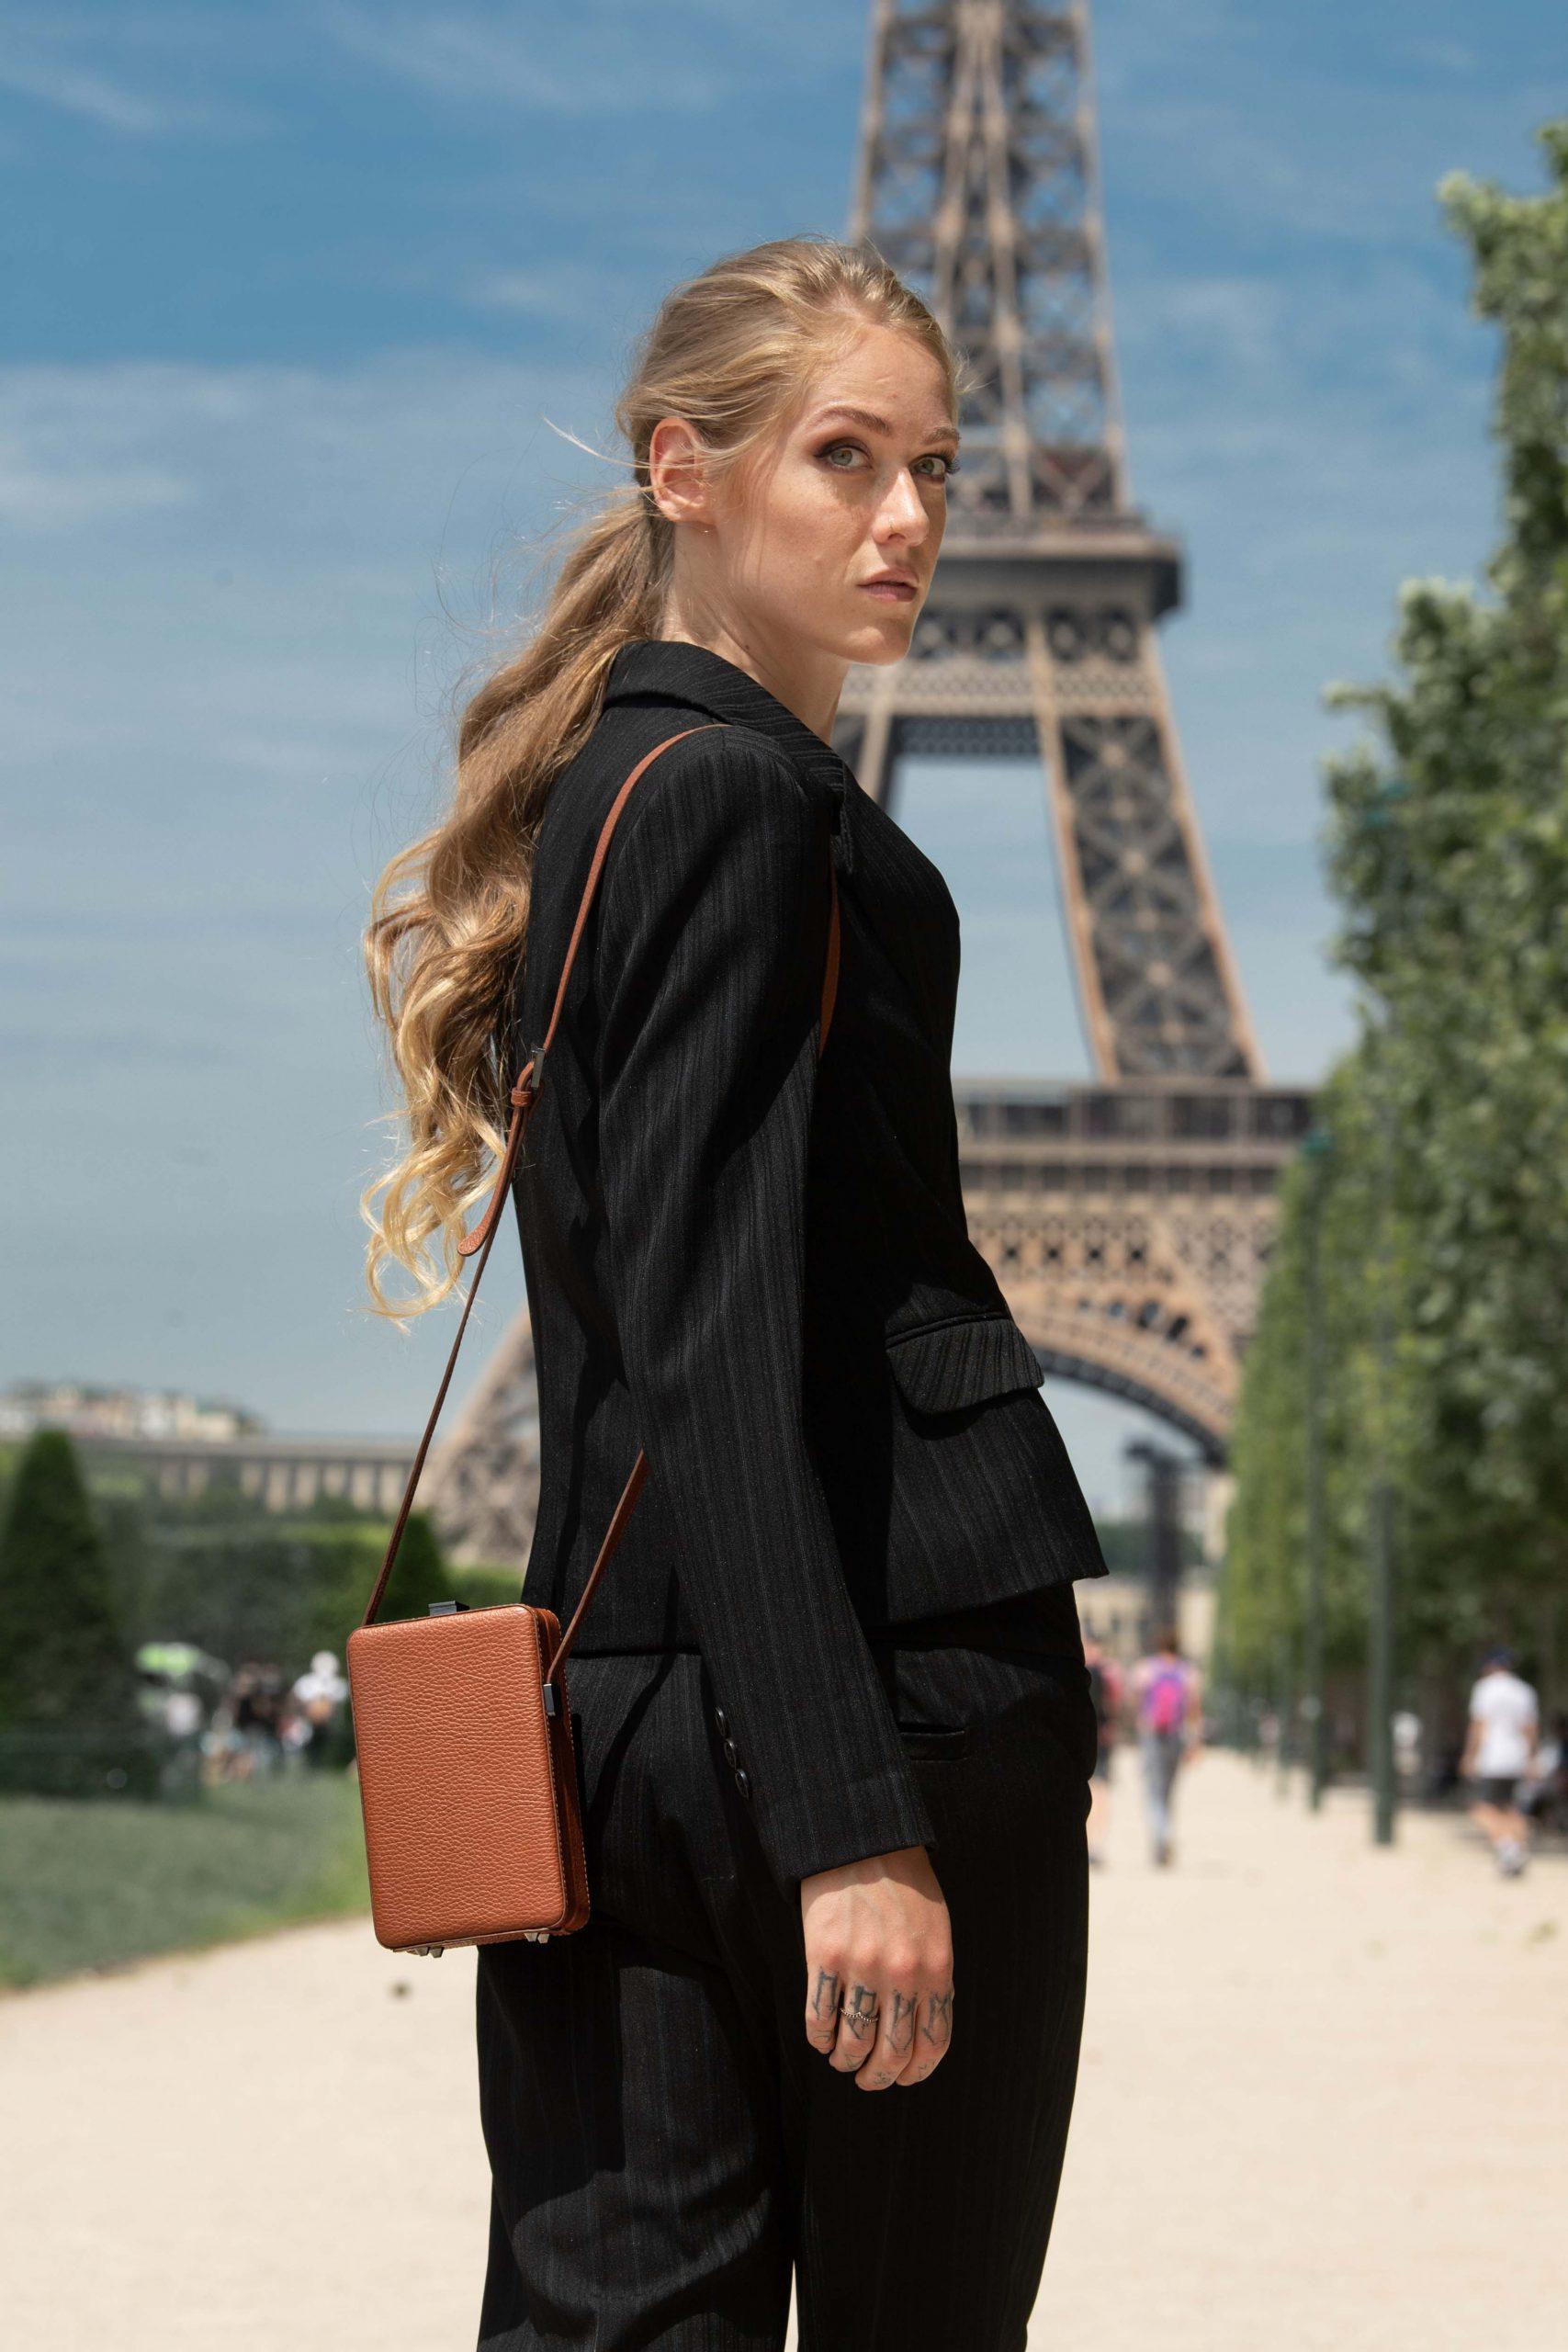 Comissioned for Frau Frieda Handbags 8